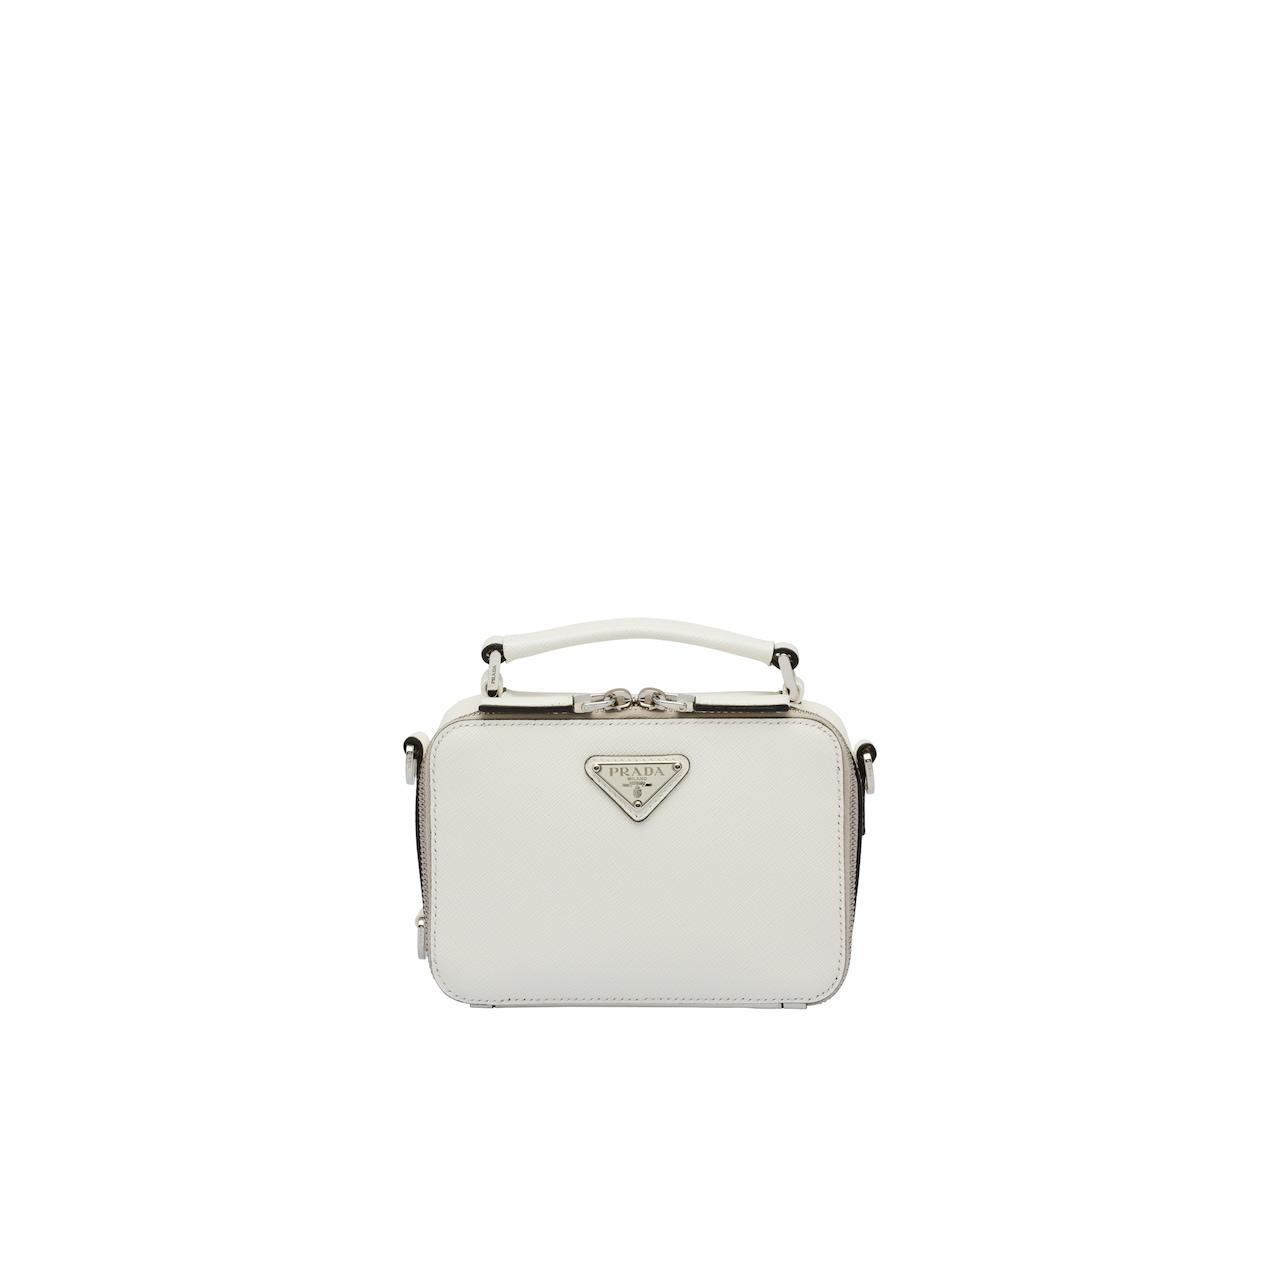 Prada Brique Tasche aus Saffiano Leder